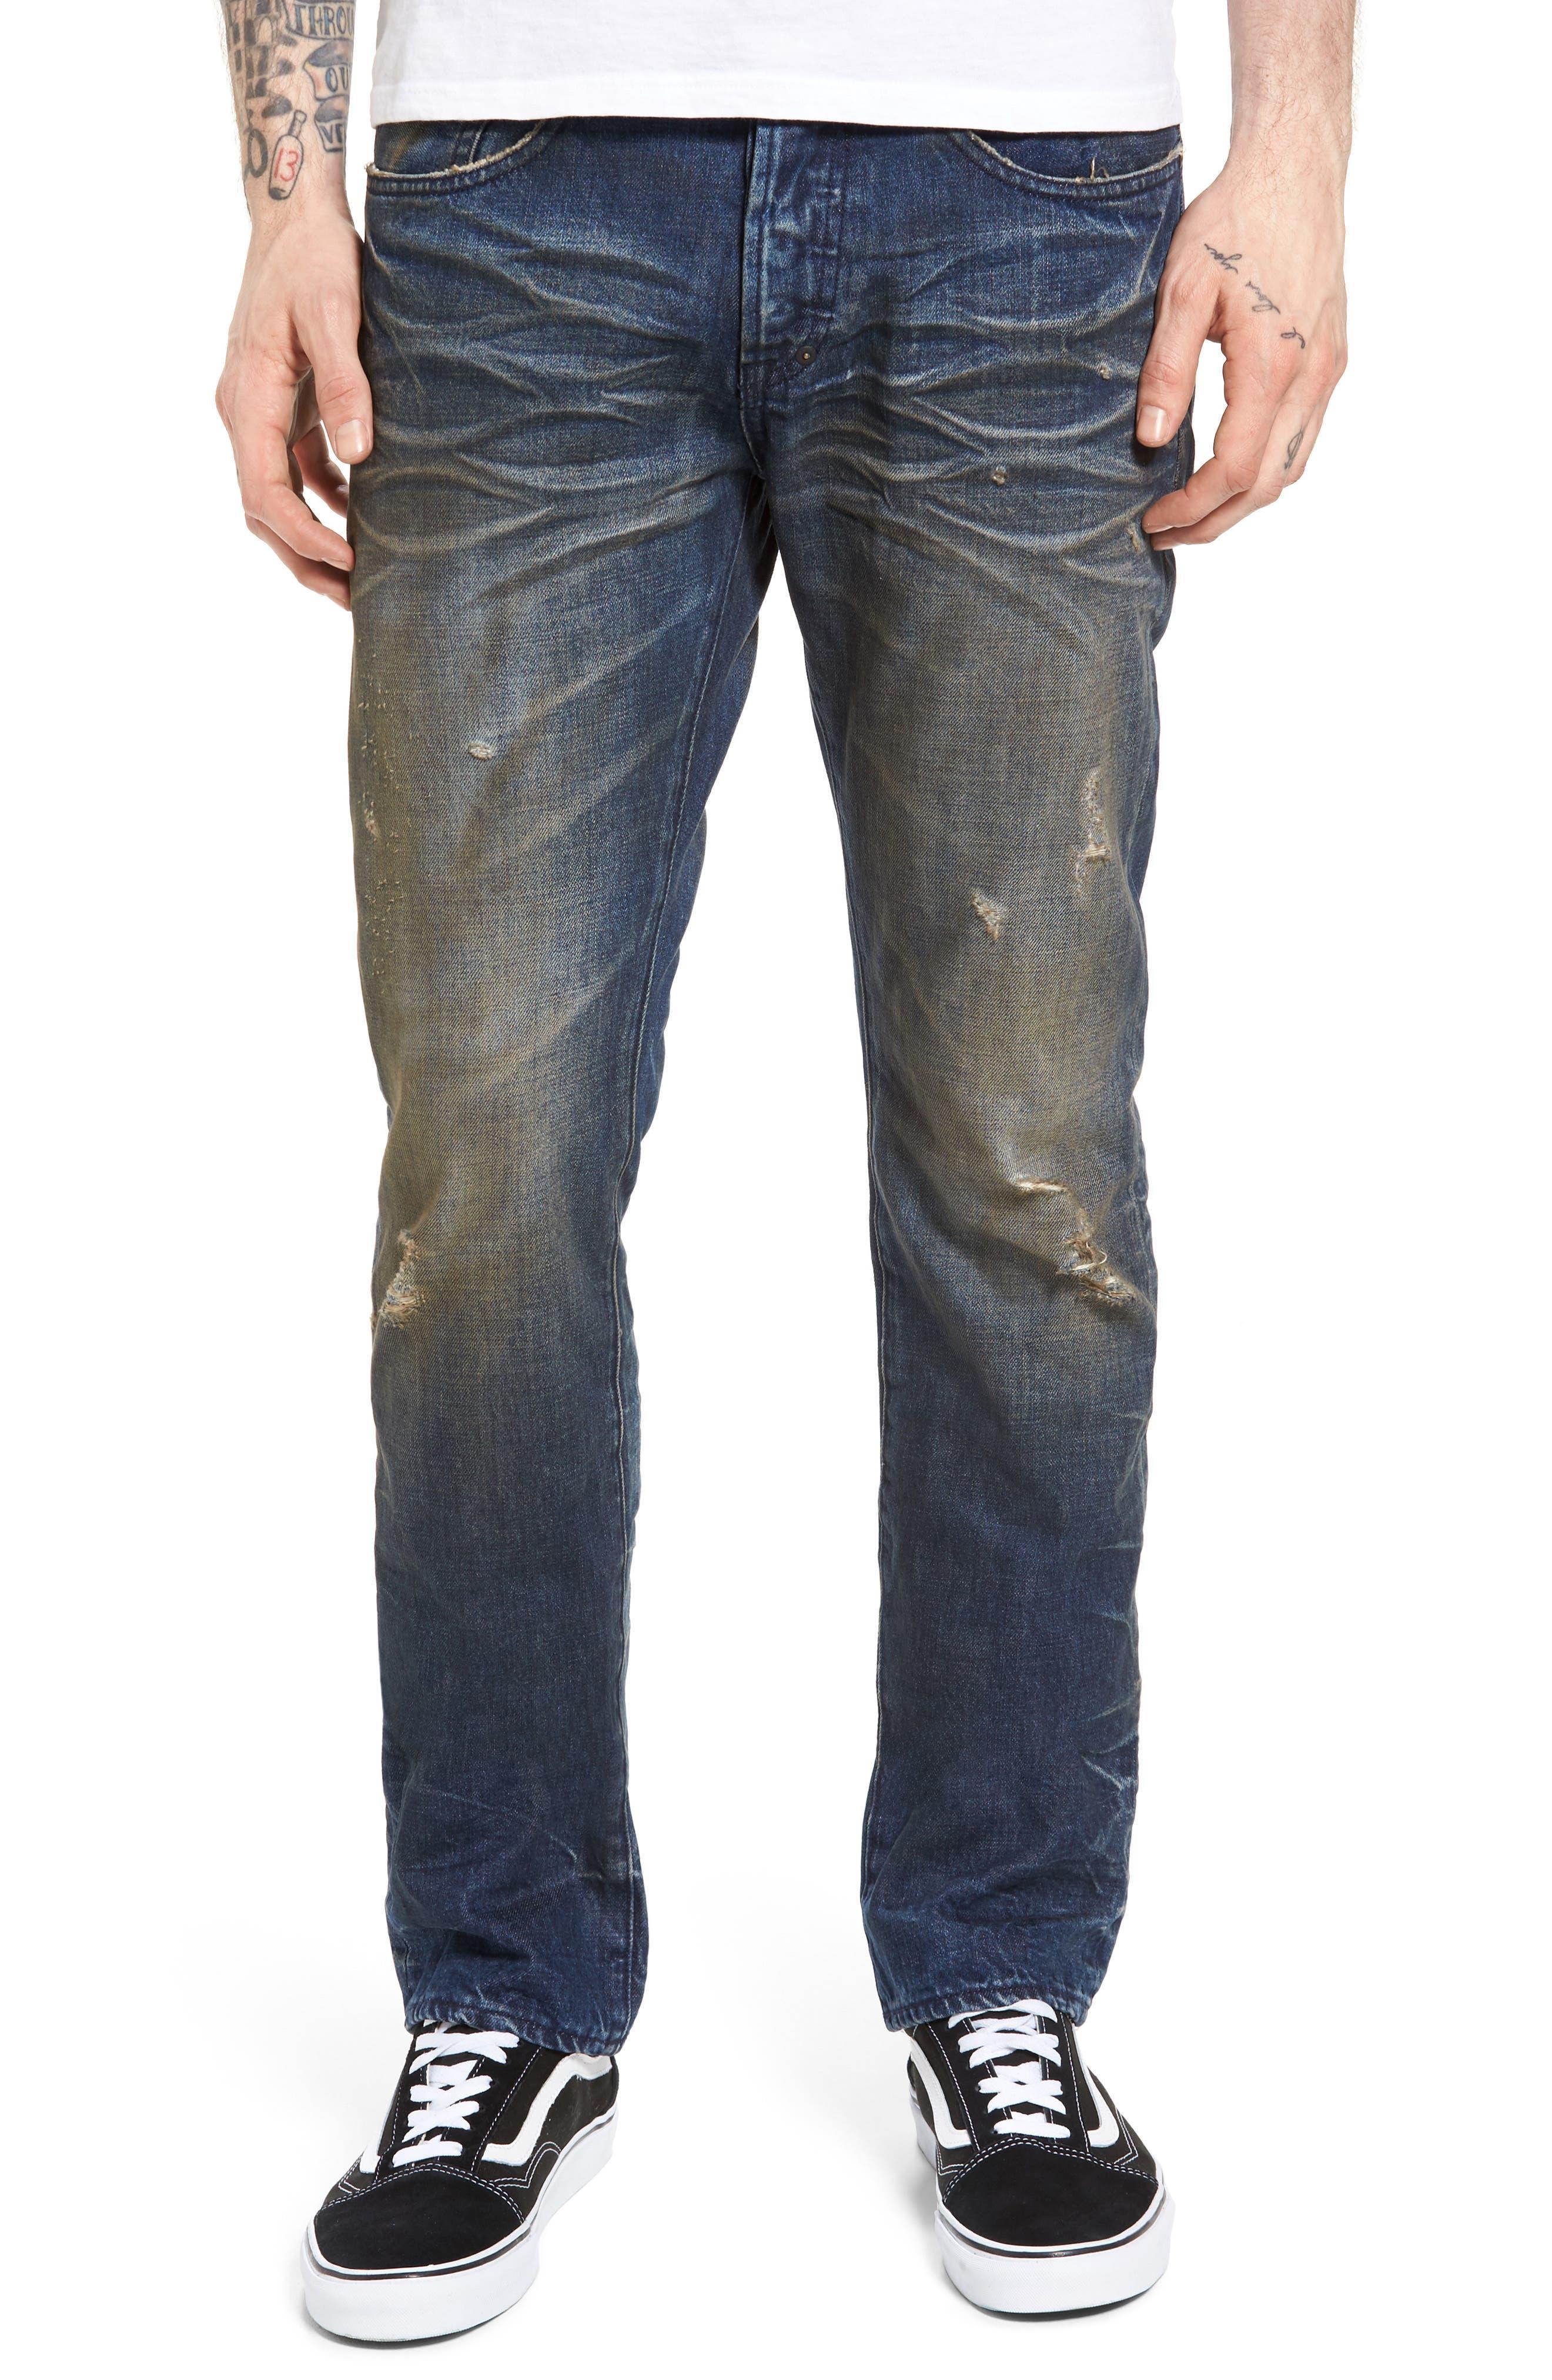 Demon Slim Straight Leg Jeans,                         Main,                         color,